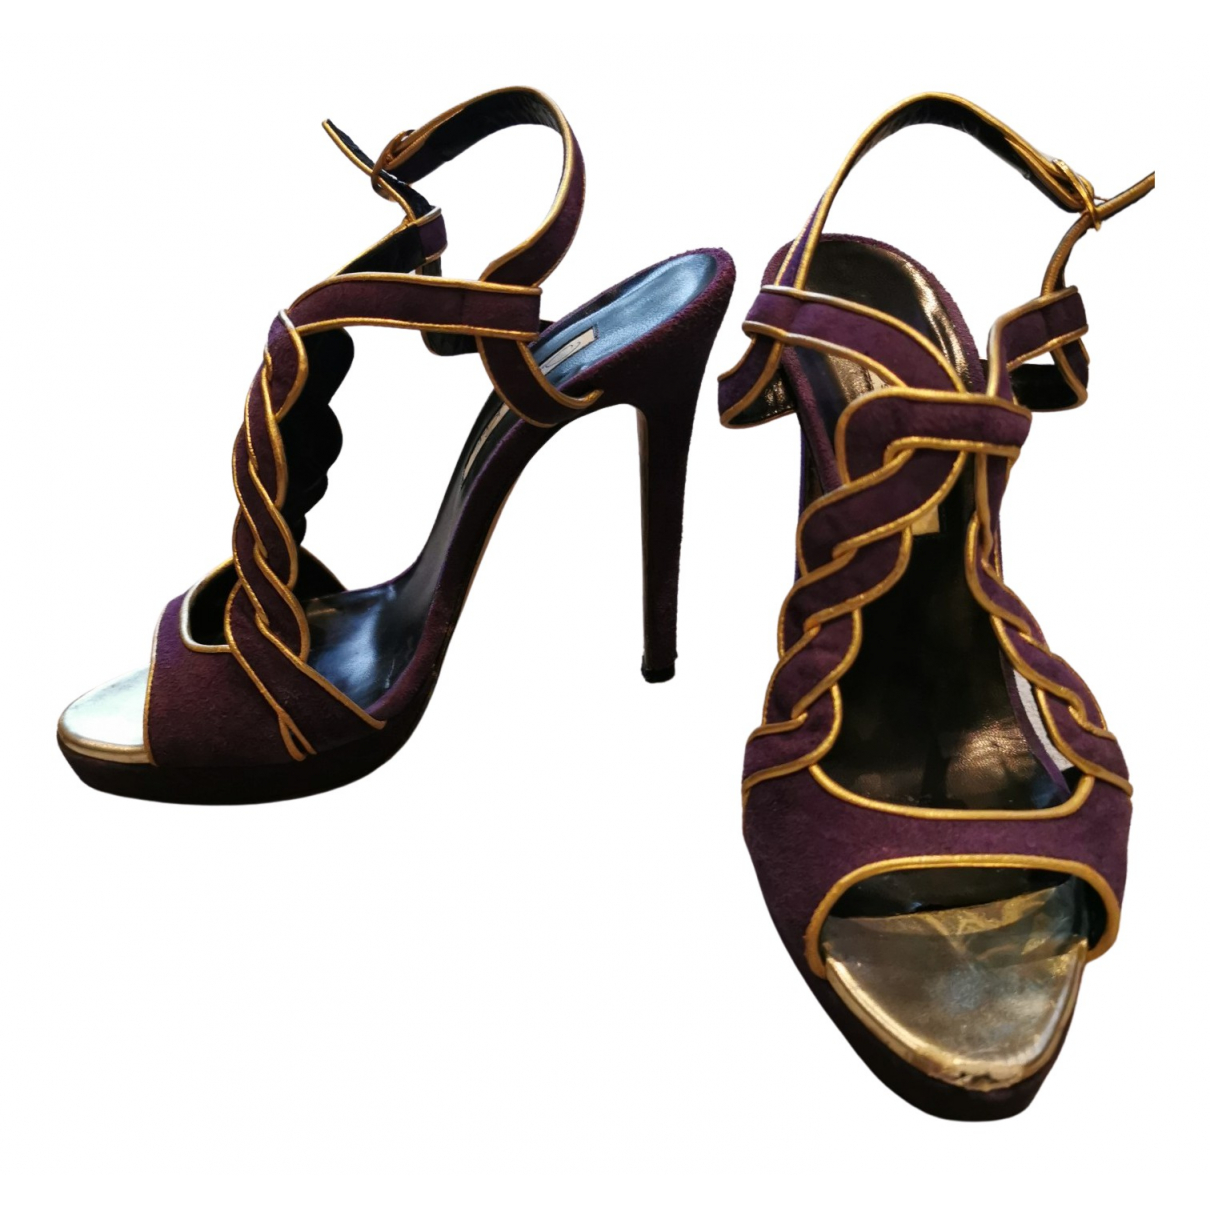 Oscar De La Renta N Purple Suede Sandals for Women 36.5 EU